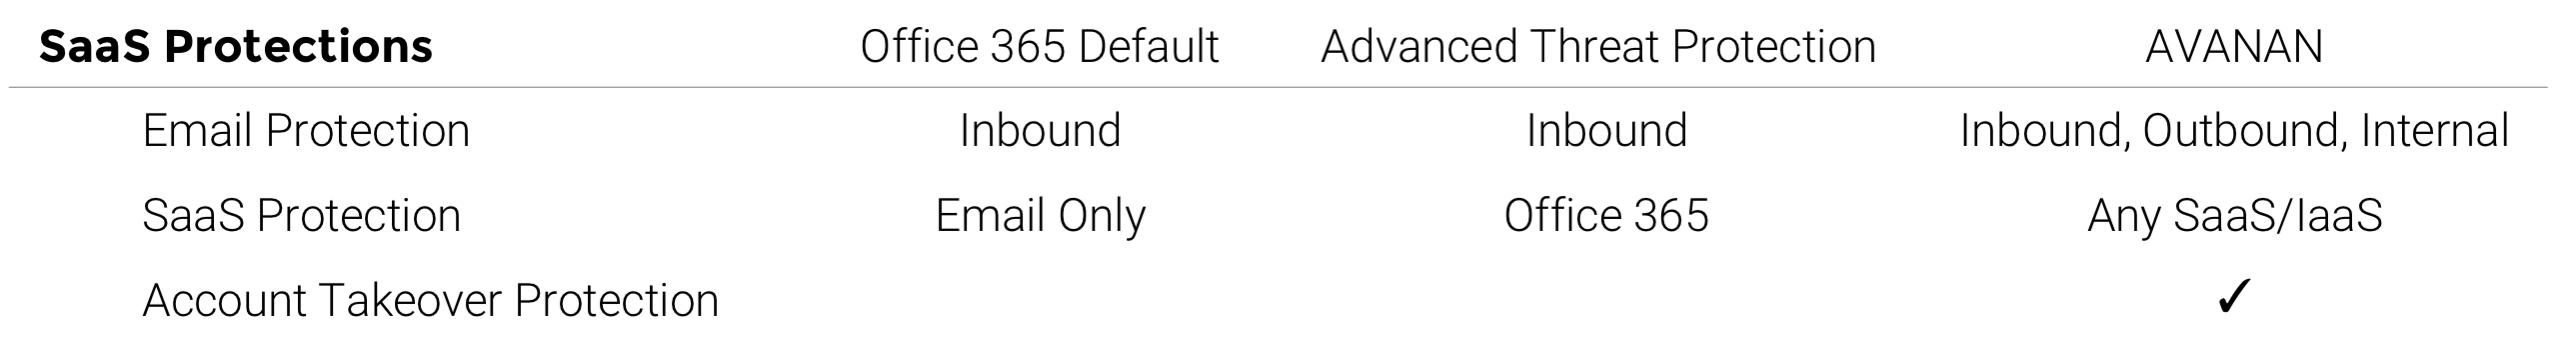 Avanan vs SaaS Advancd Threat Protection